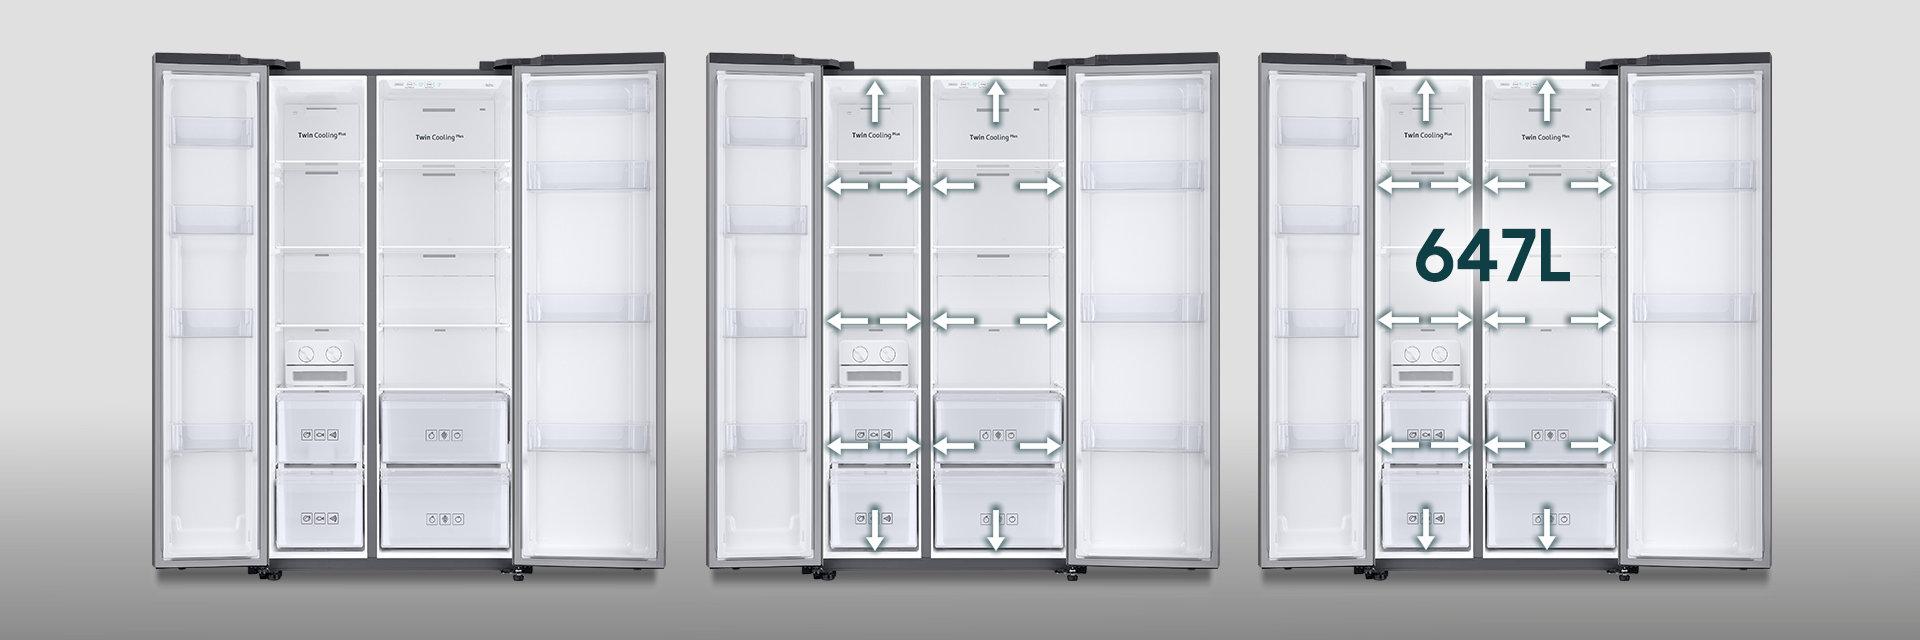 Samsung Chladničky Rs66n8100s9 Spousta míst